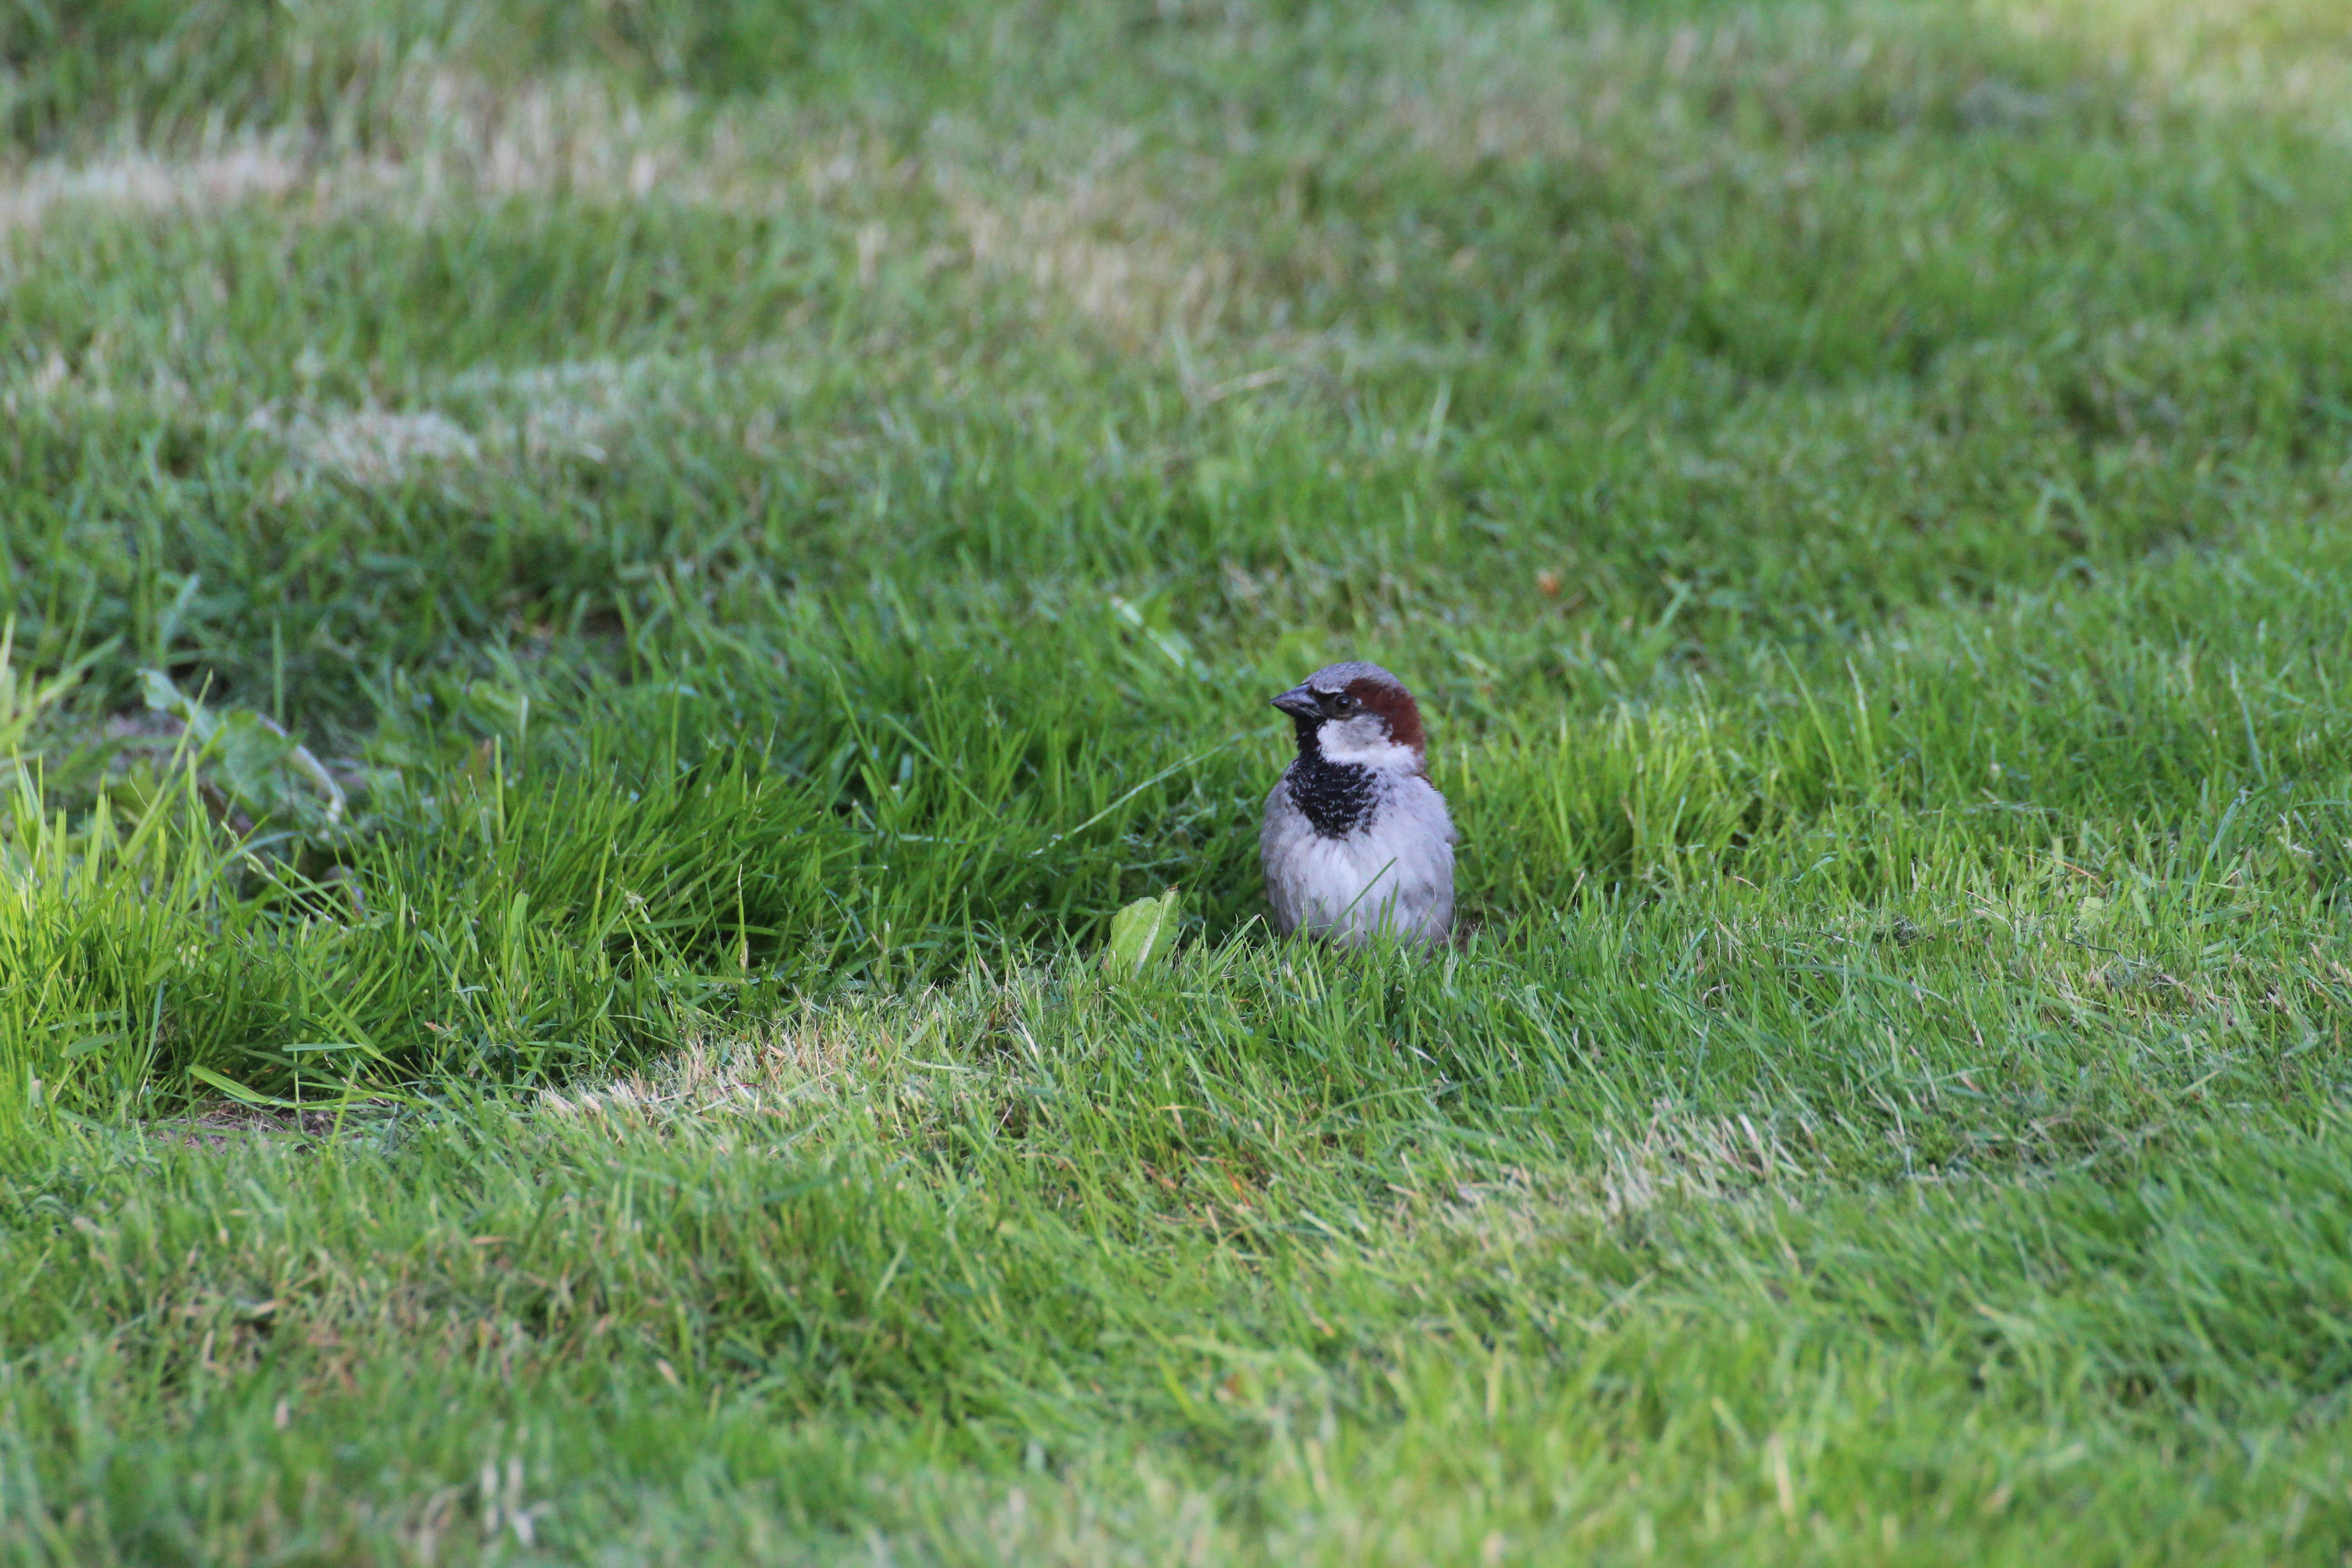 vogel bild sperling bilder vogel